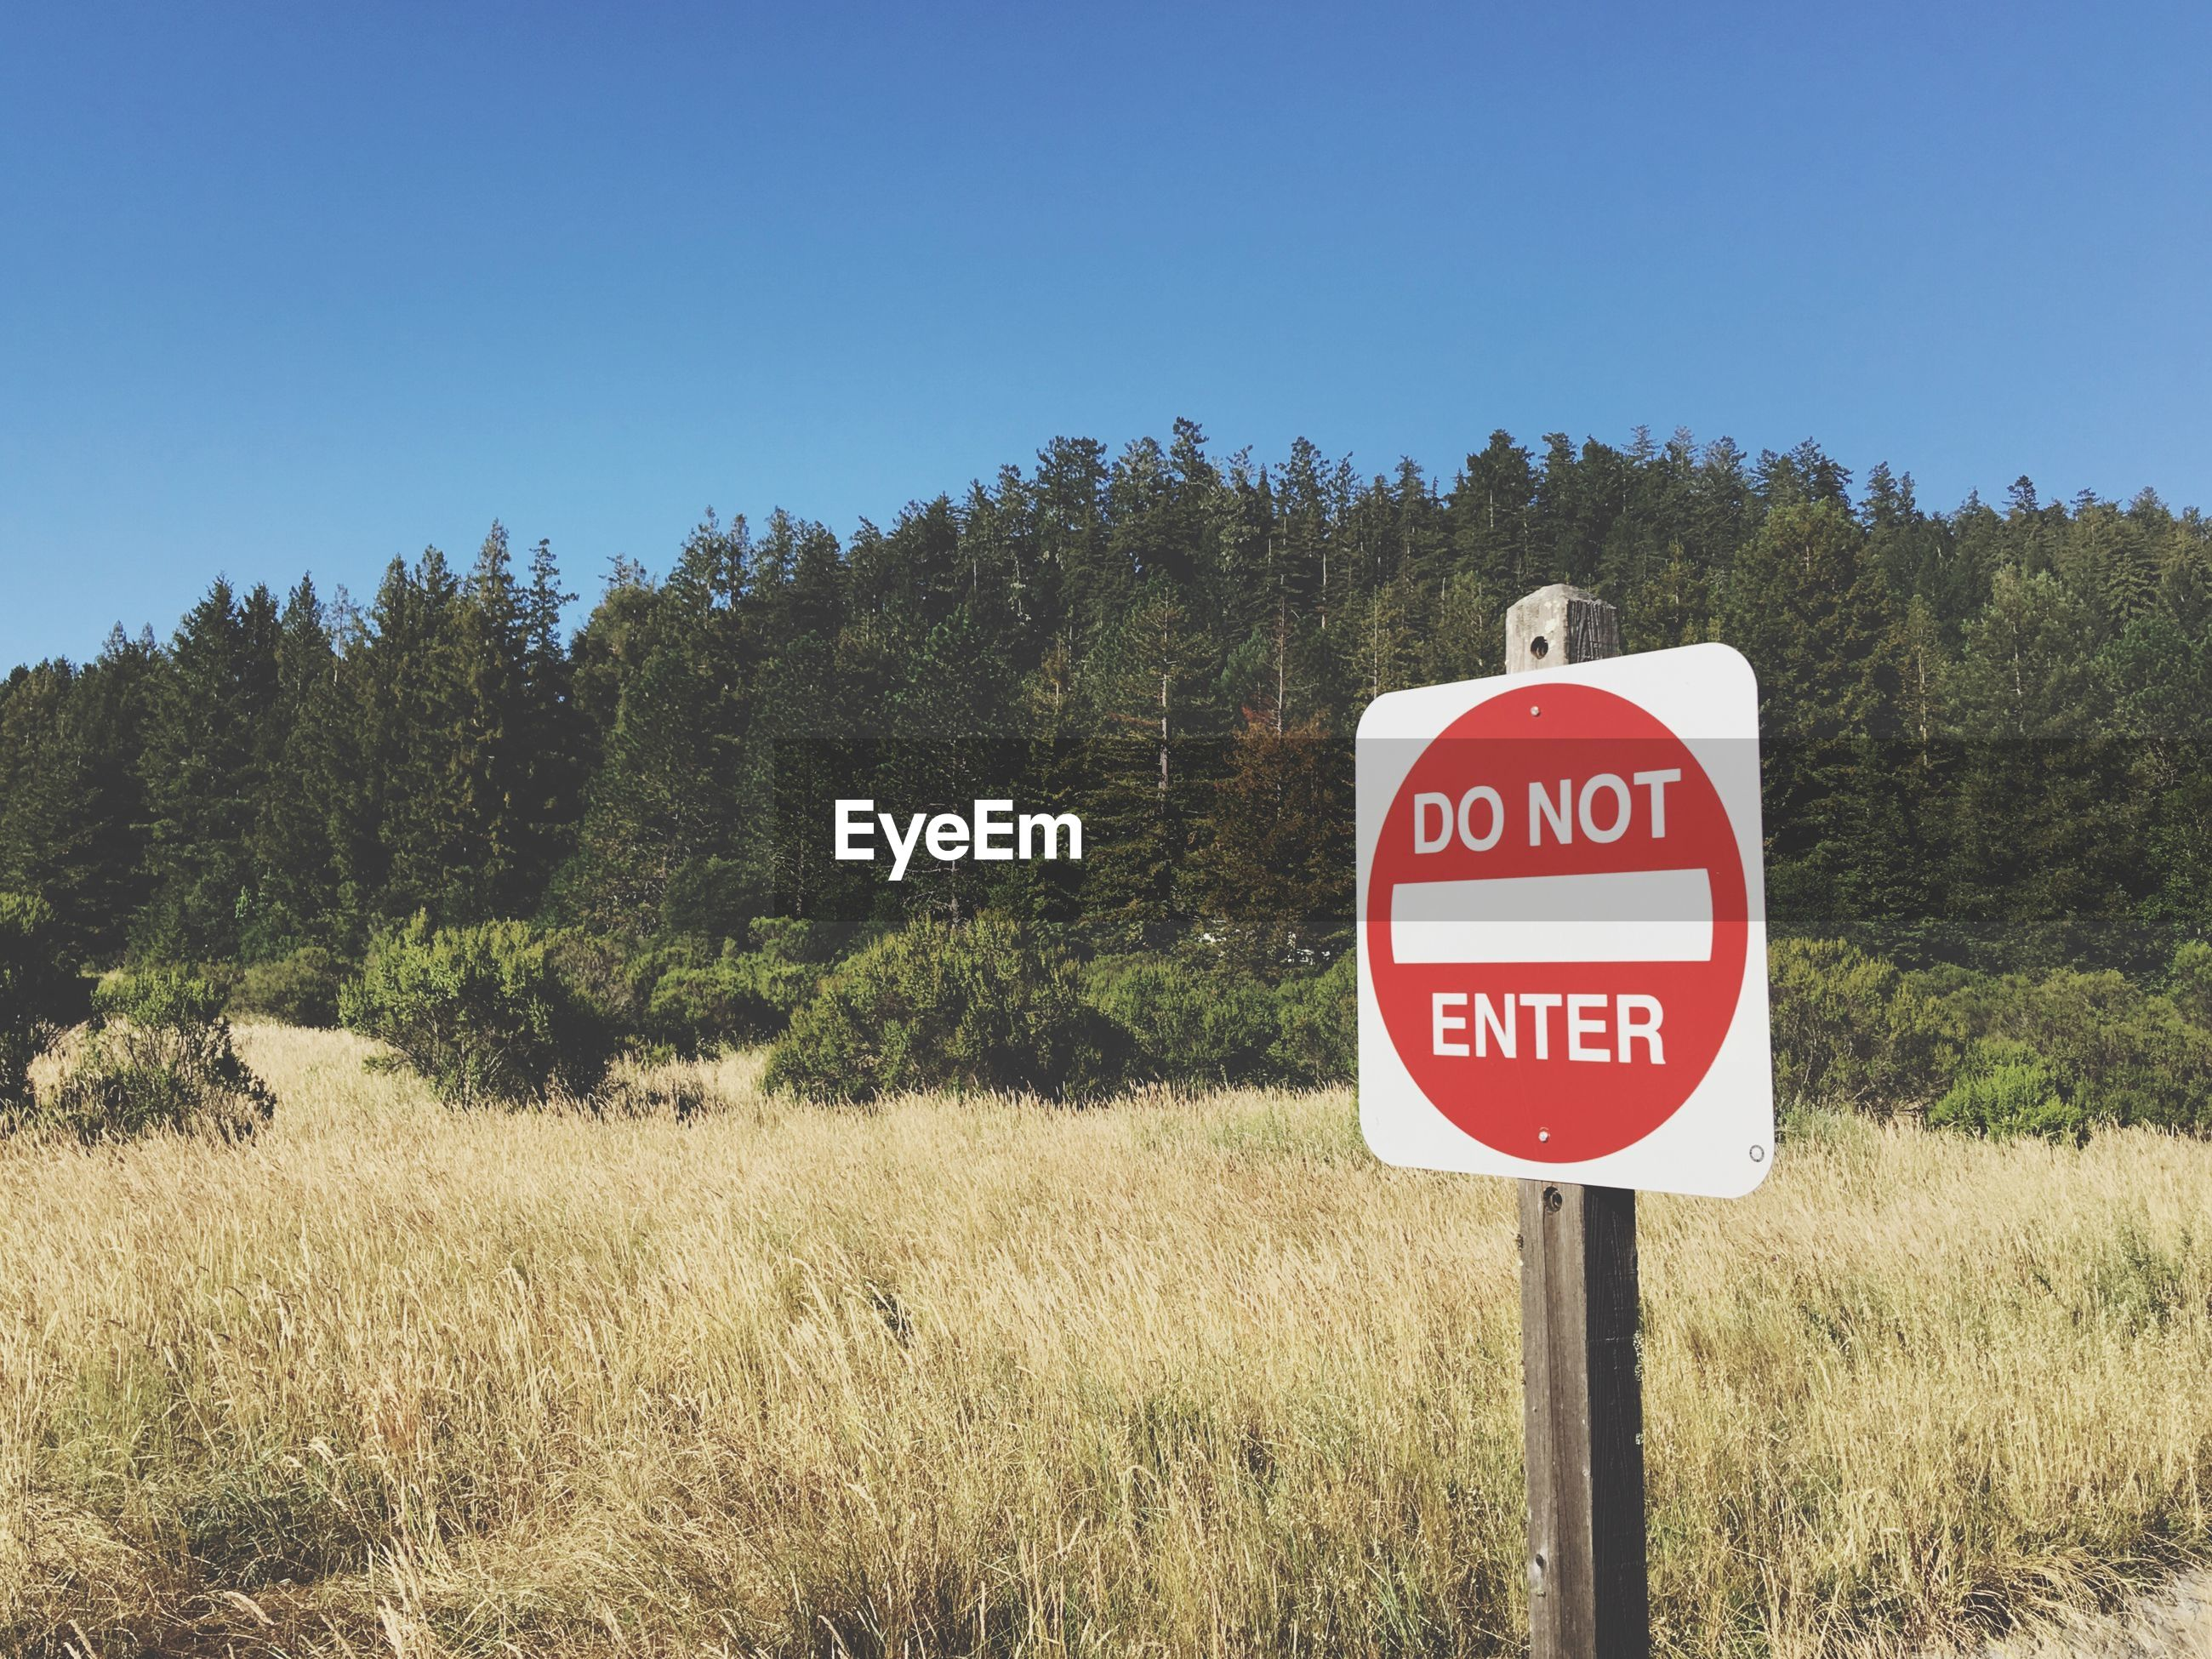 Do not enter sign on field against sky